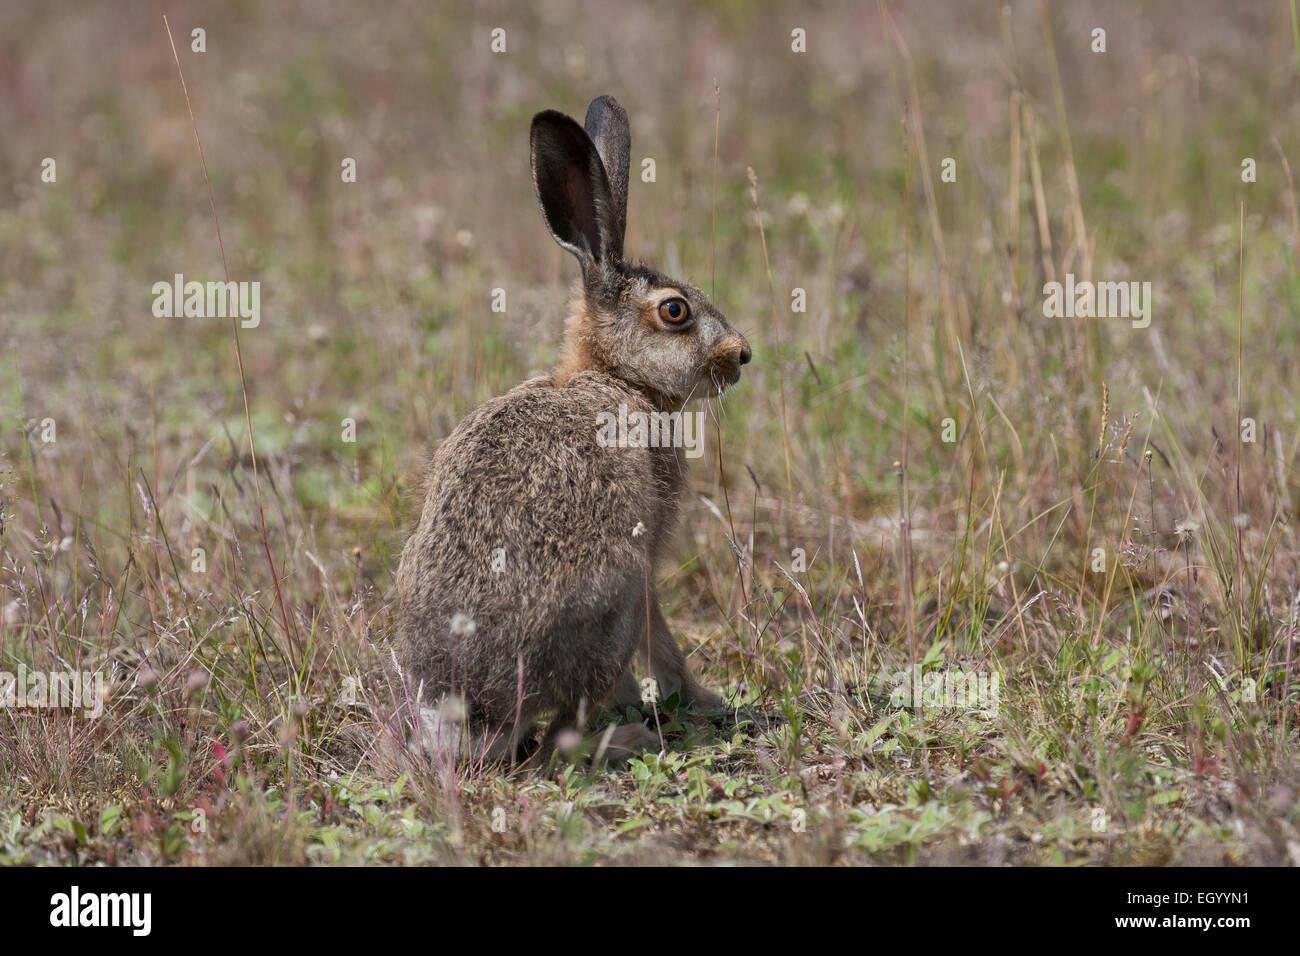 European hare, Brown Hare, hares, Feldhase, Feld-Hase, Hase, Lepus europaeus, Lièvre d'Europe - Stock Image